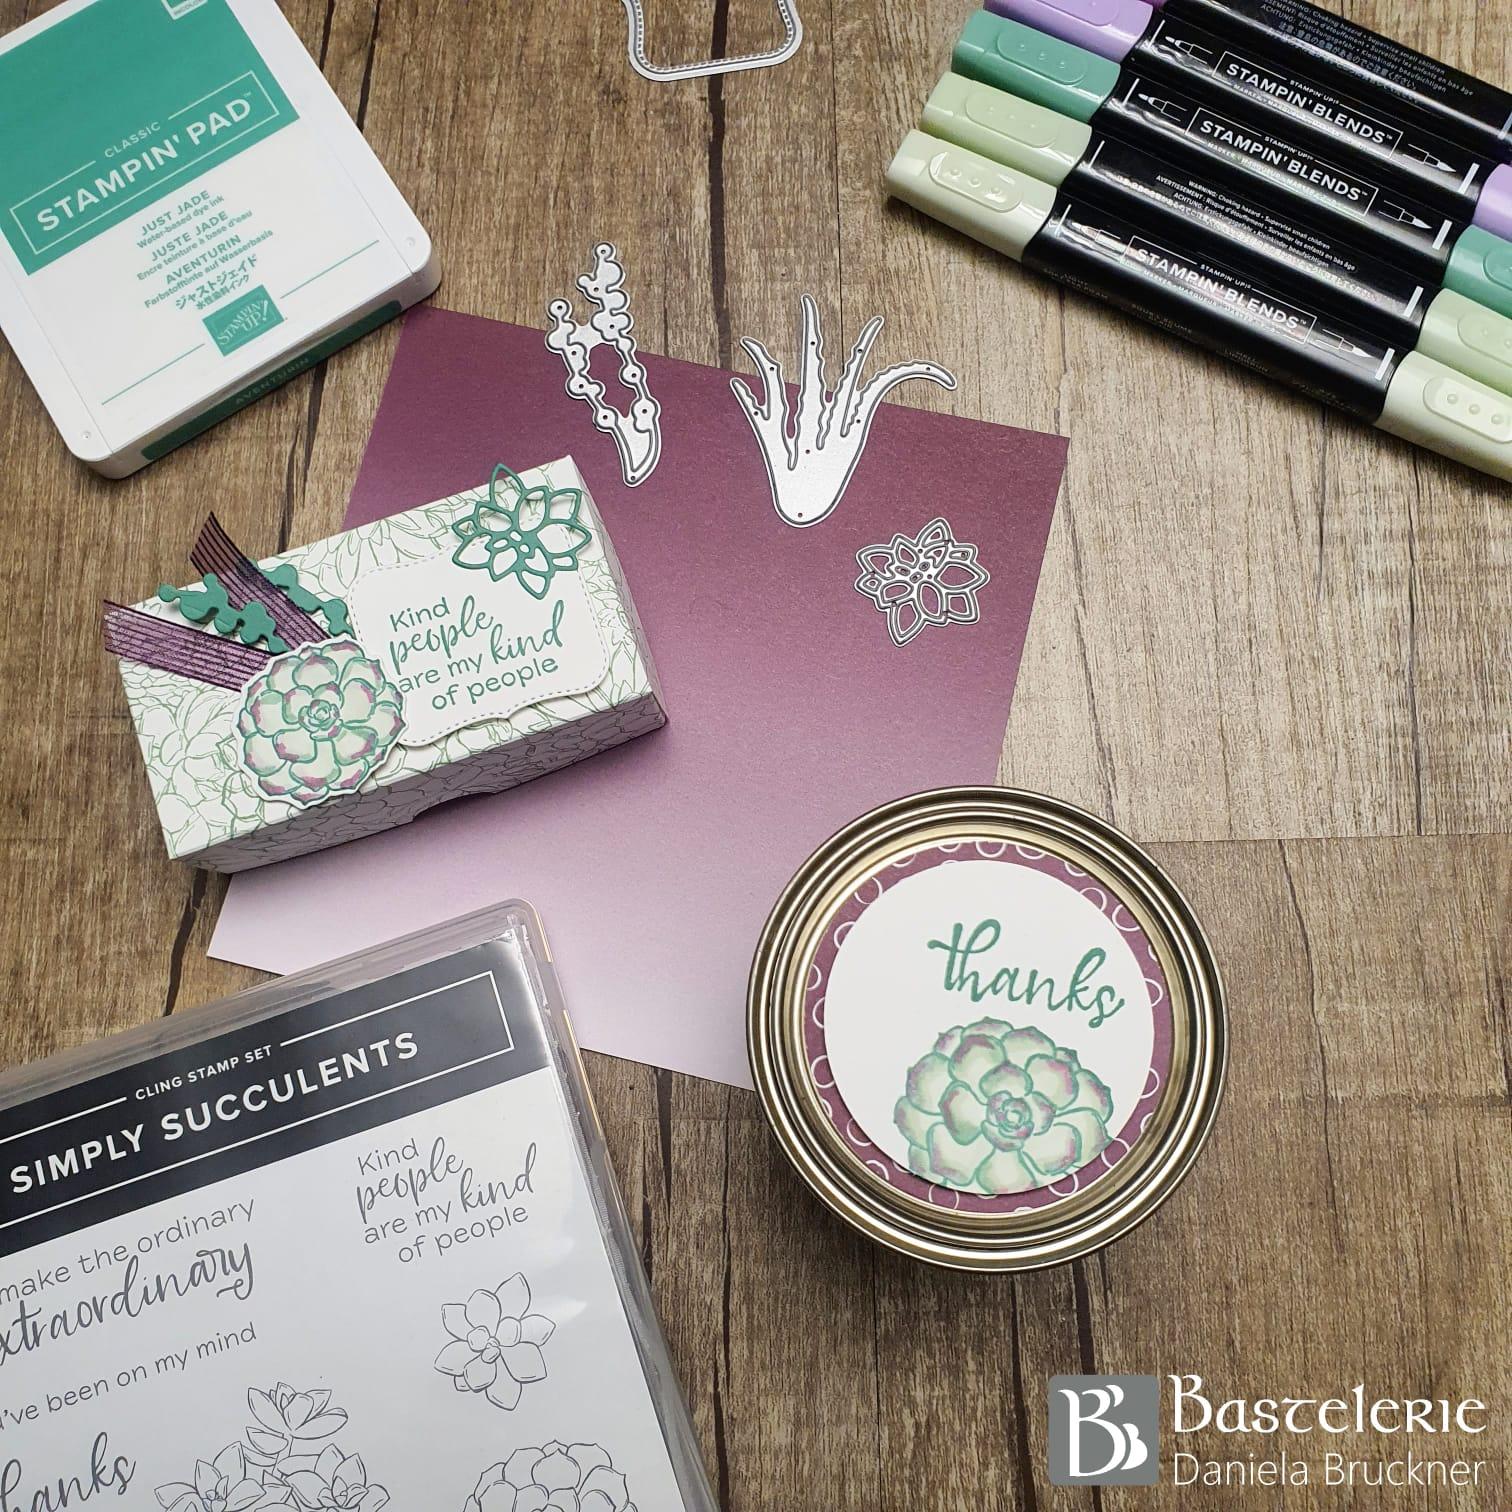 BlogHop_PaperWitches_Minikatalog_Succulenten_202101